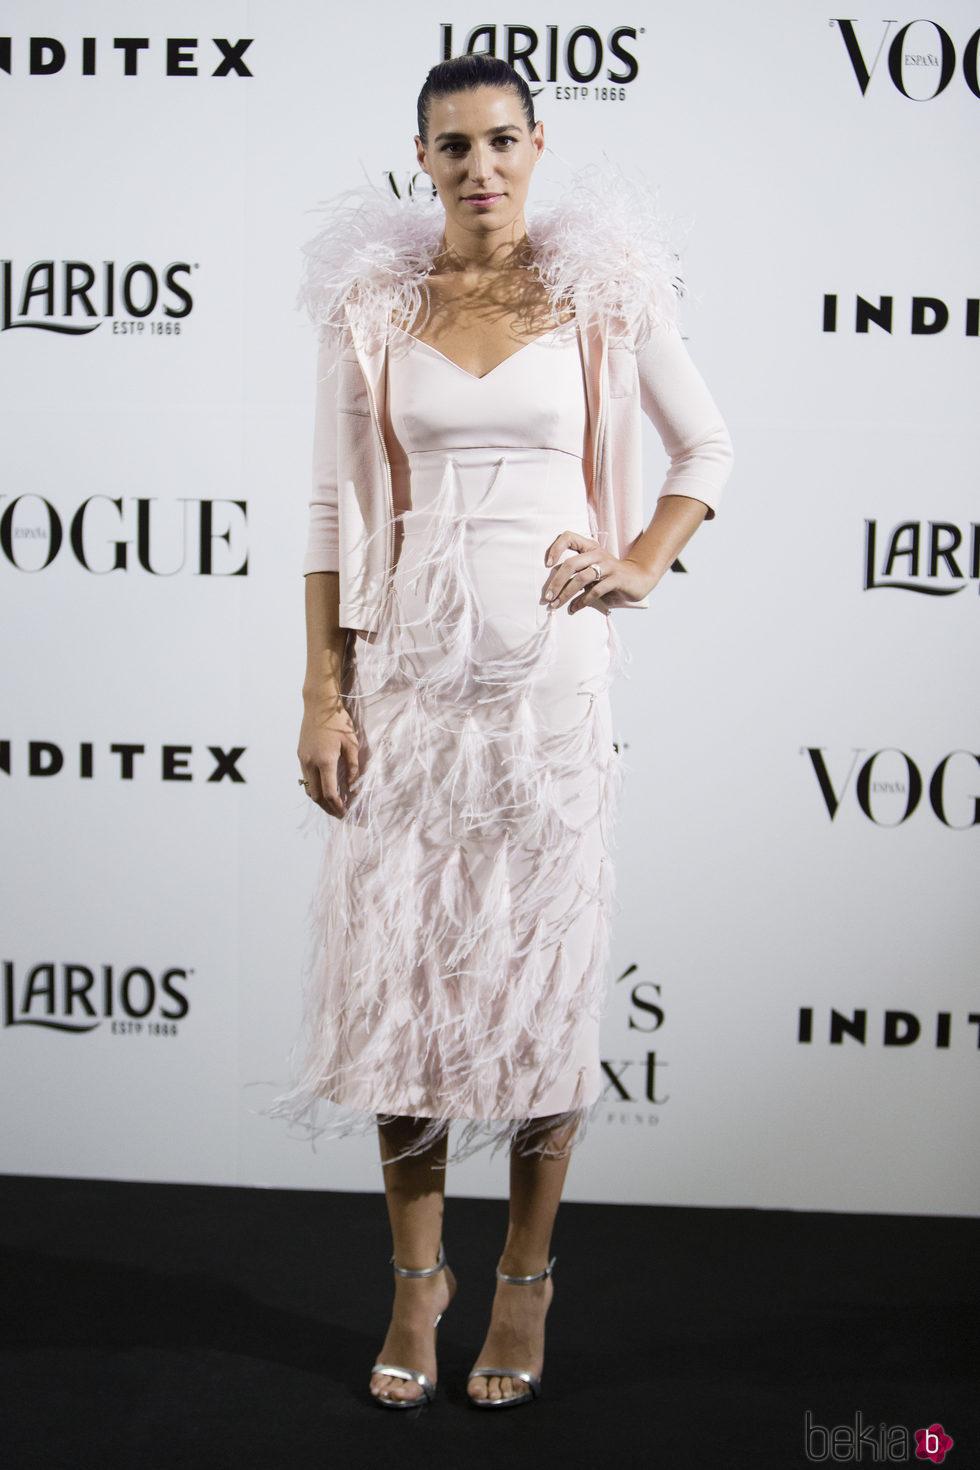 Eugenia Osborne en la fiesta Vogue Who's on next 2017